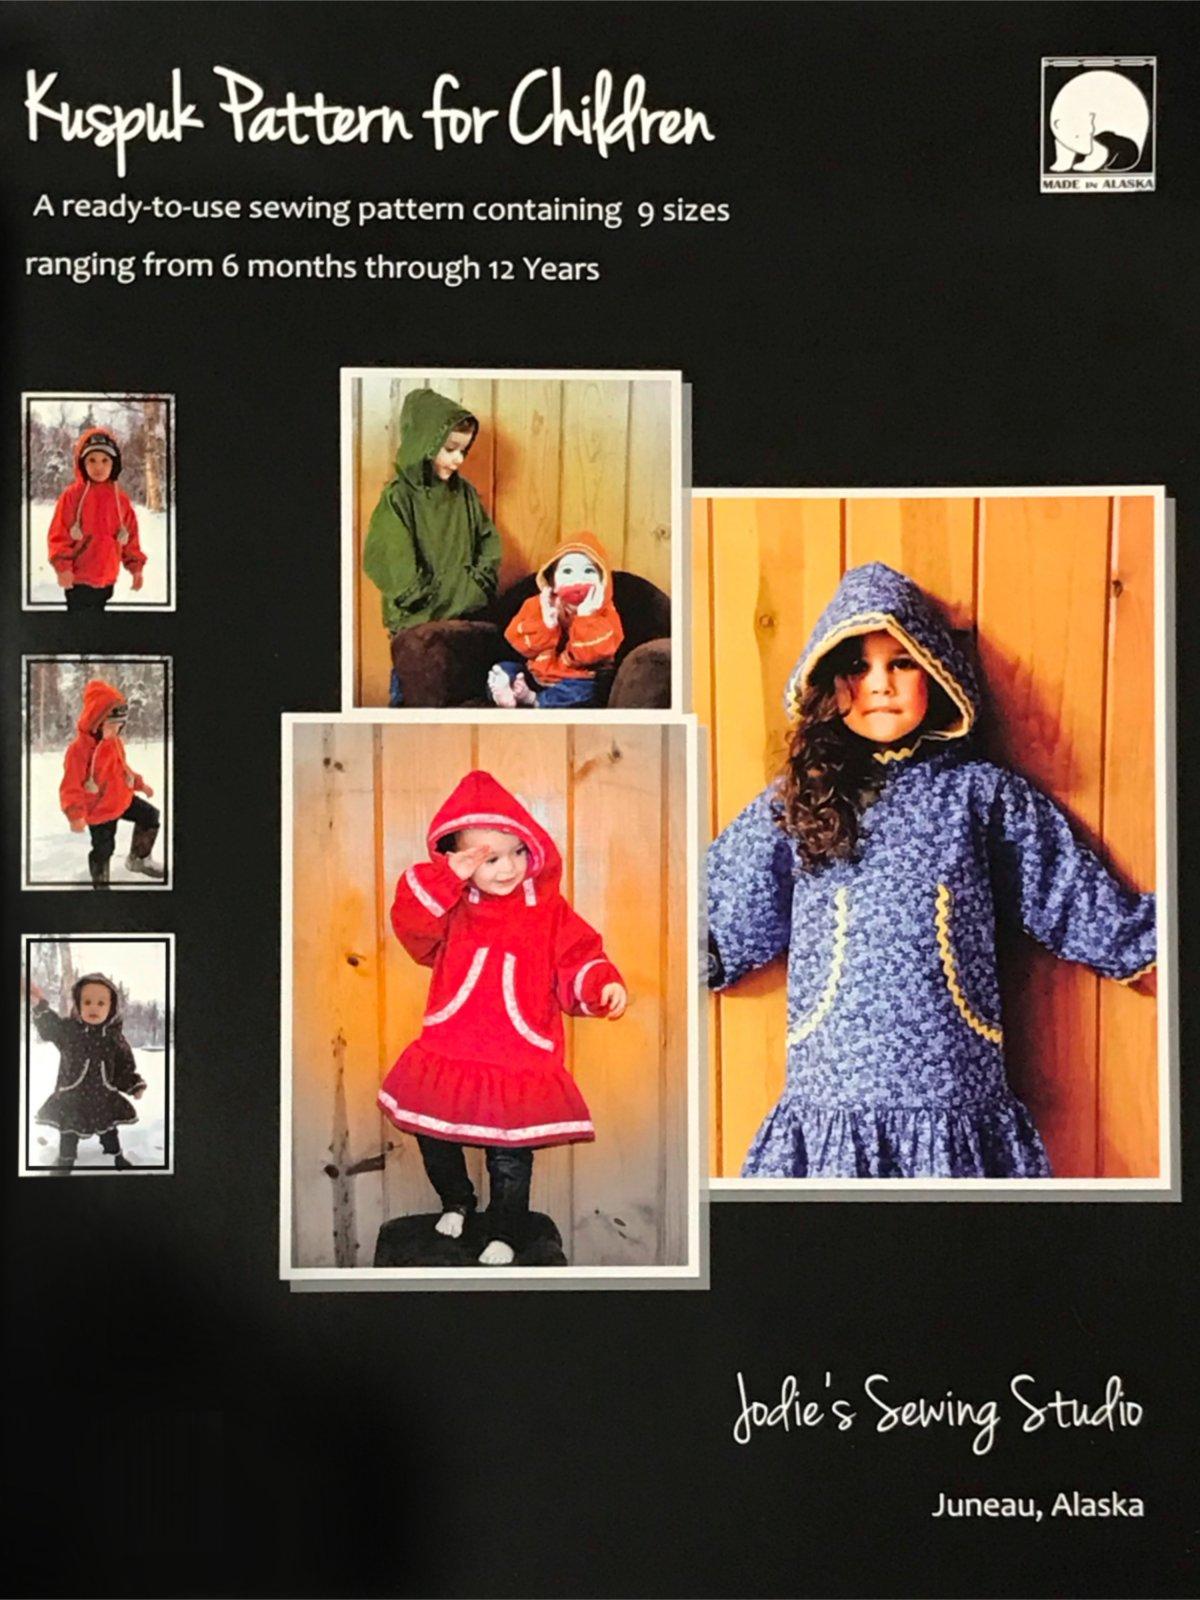 Jodie's Sewing Studio Kuspuk for Children Size's 6 months - 12 years